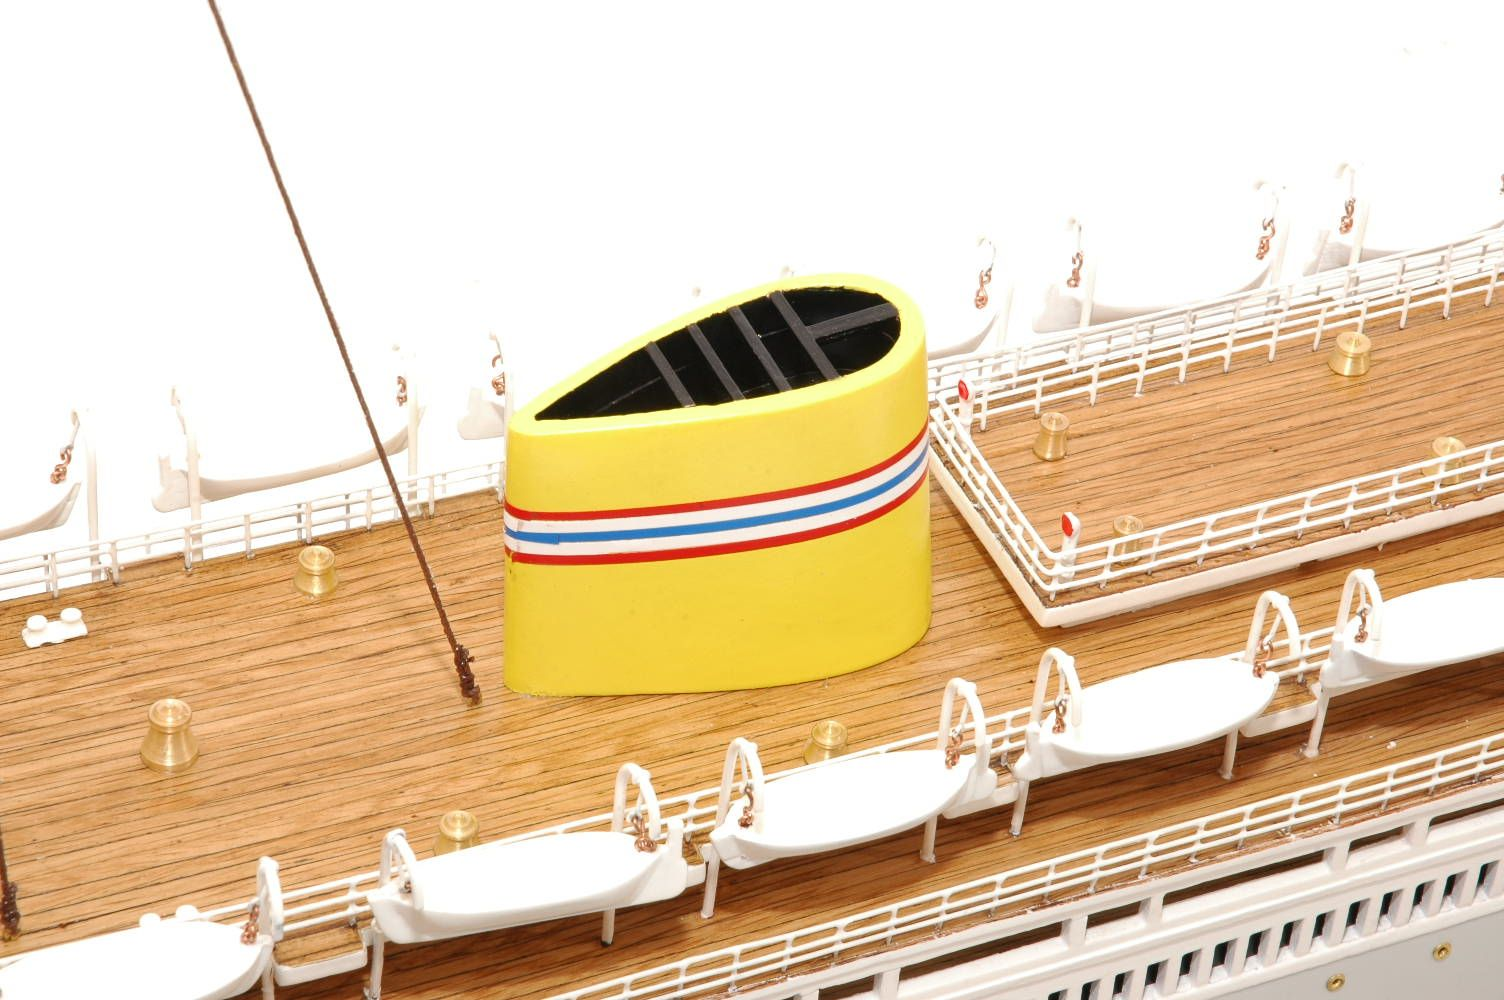 549-6437-Bergensfjord-model-ship